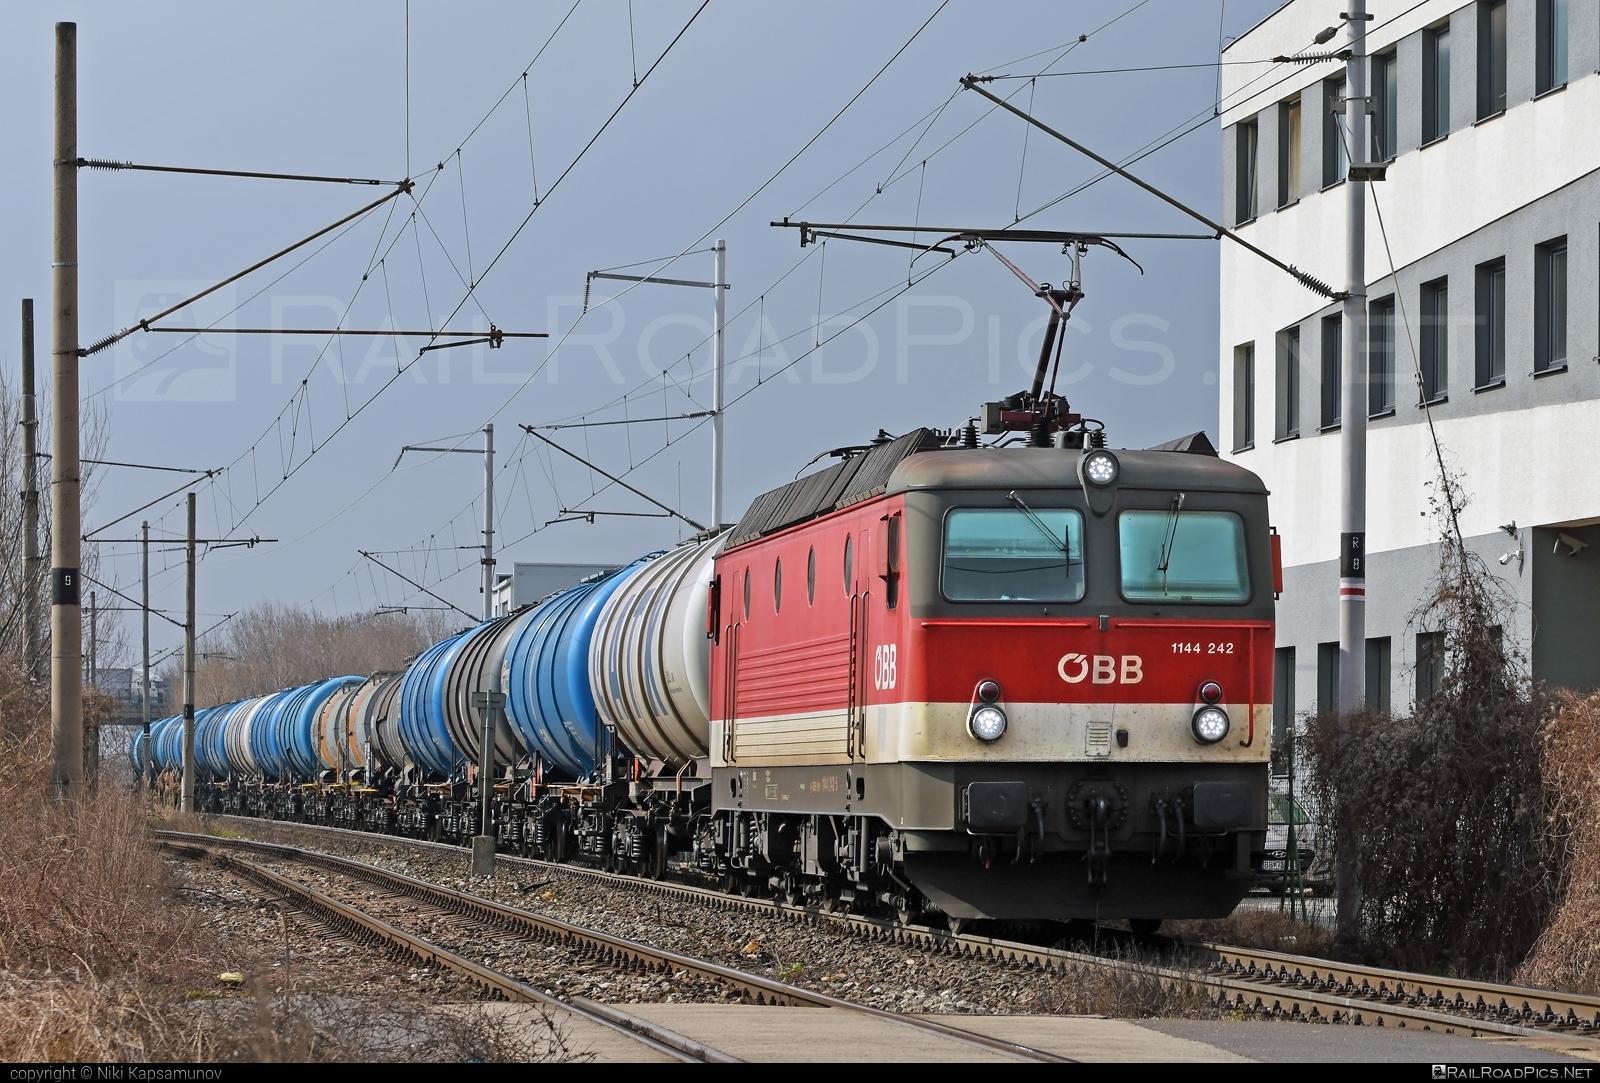 SGP ÖBB Class 1144 - 1144 242 operated by Rail Cargo Austria AG #kesselwagen #obb #obbclass1144 #osterreichischebundesbahnen #rcw #sgp #sgp1144 #simmeringgrazpauker #tankwagon